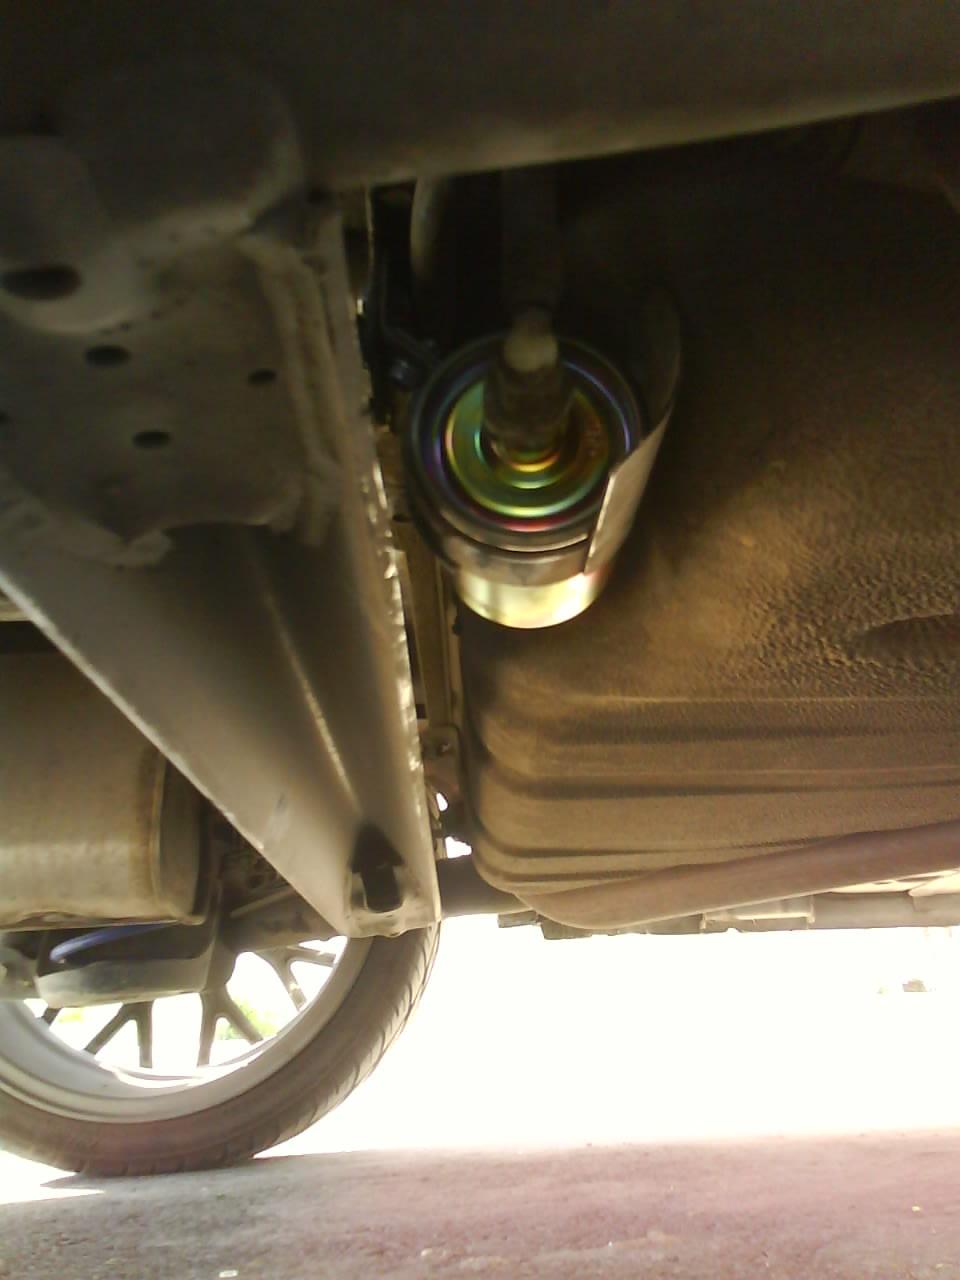 2005 Chevy Fuel Filter Location 2000 Hyundai Sonata